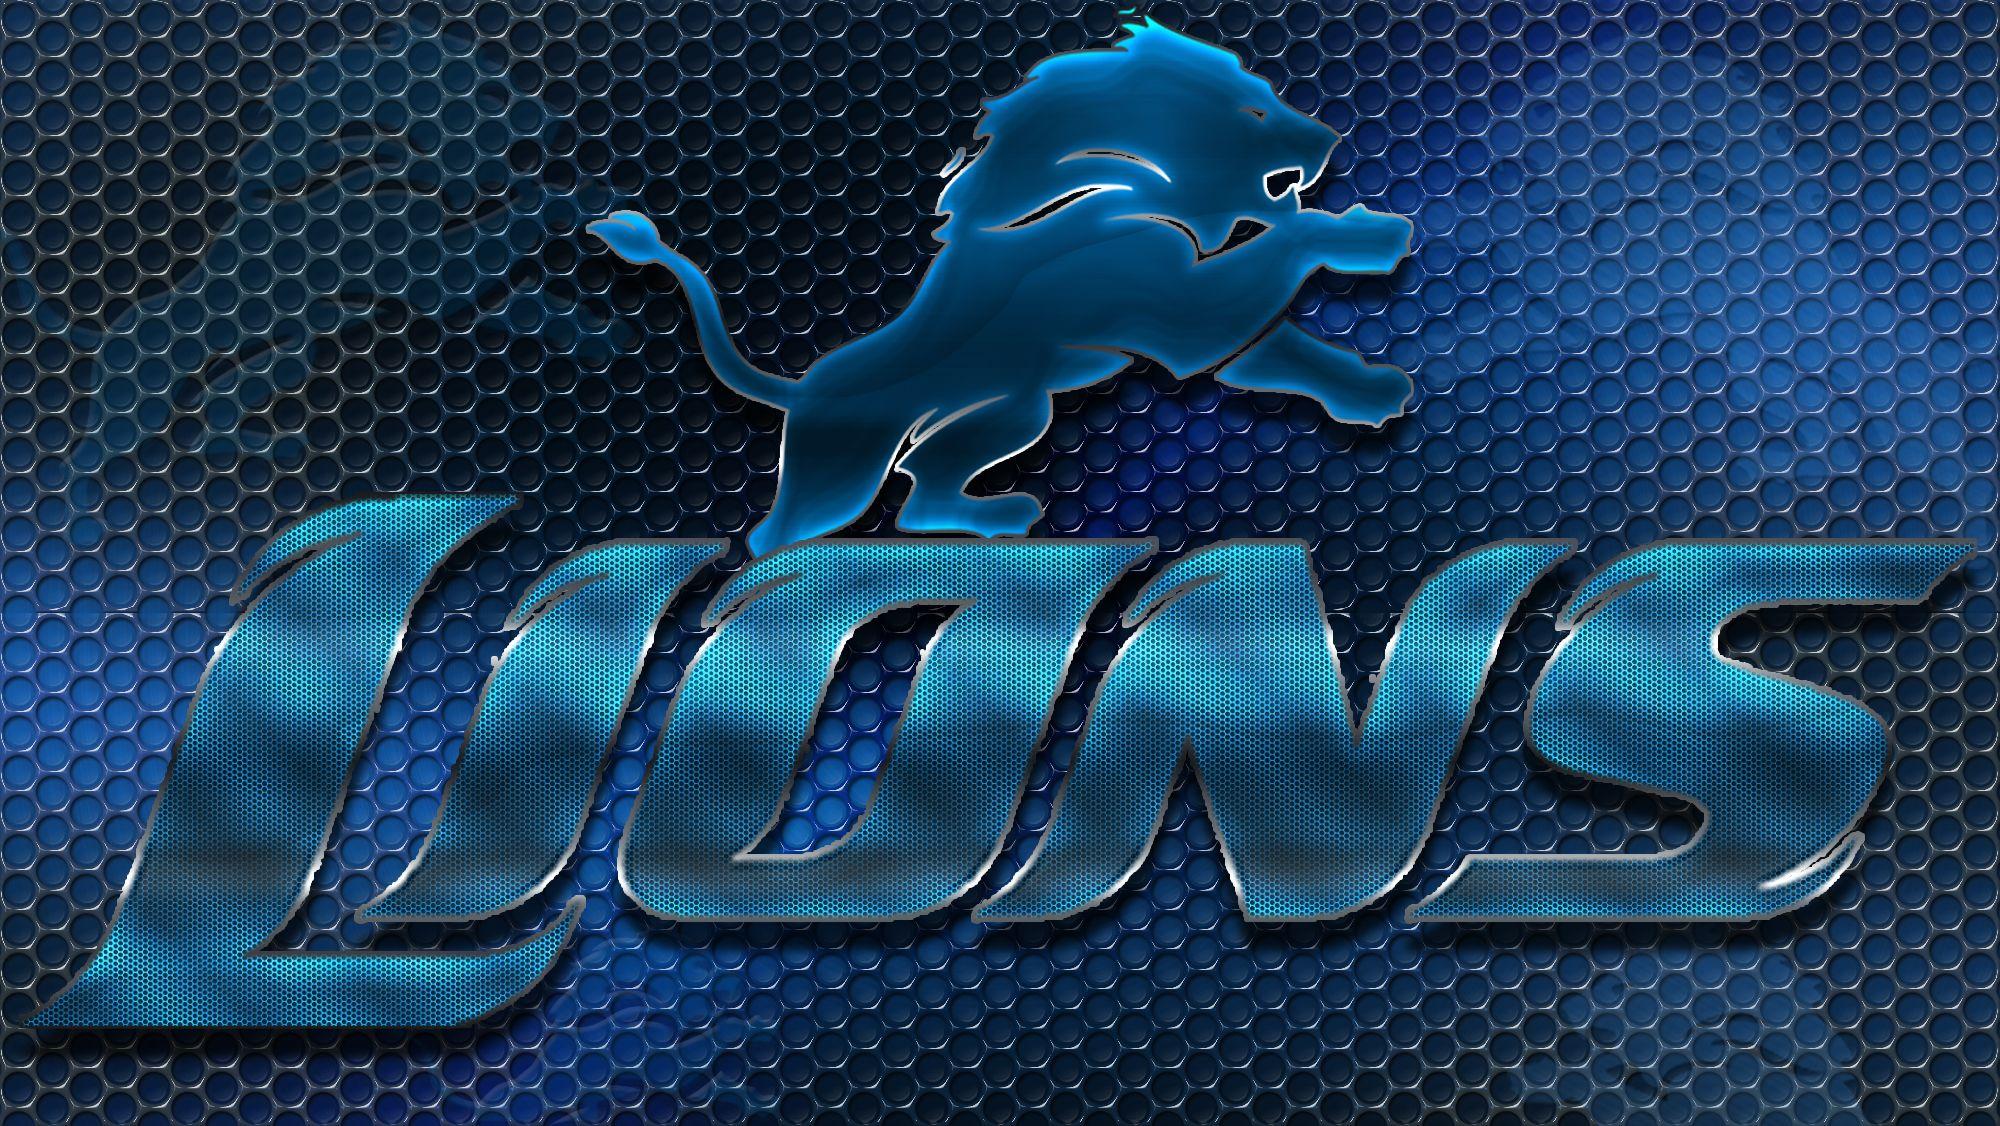 Detroit Lions Full HD Images World Sports Detroit